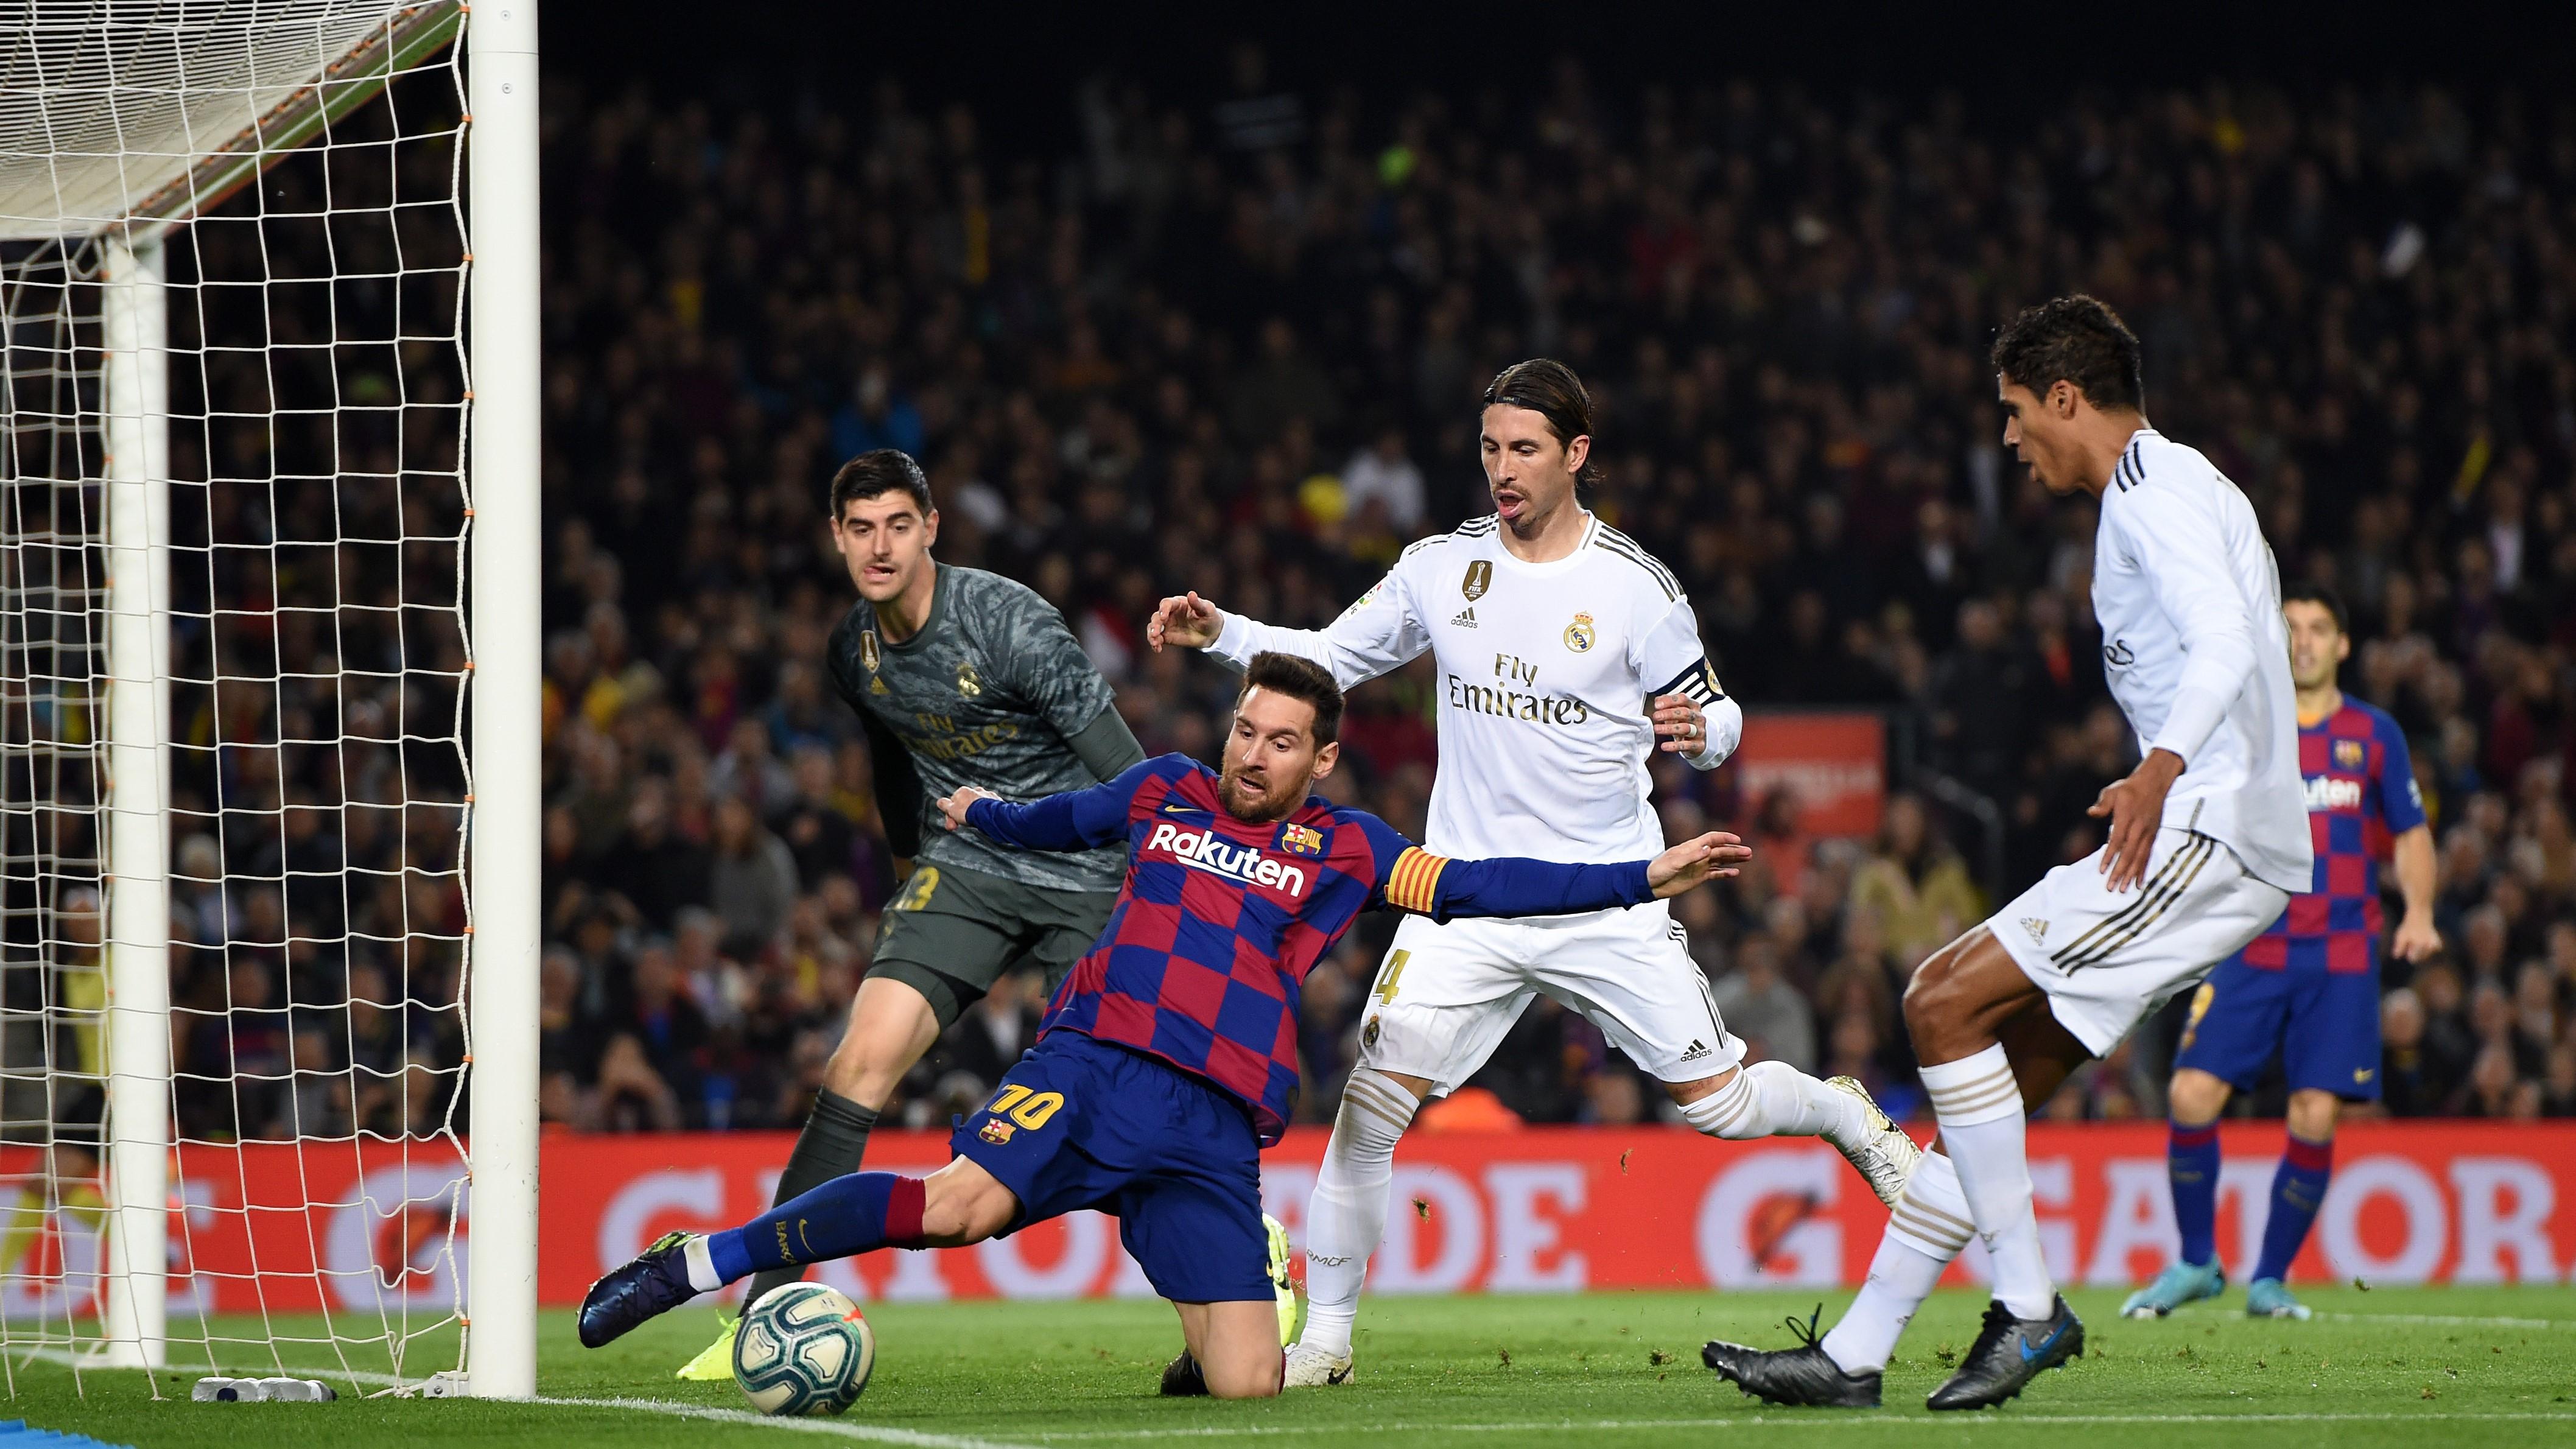 Барселона реал мадрид 1 4 смотреть онлайнi